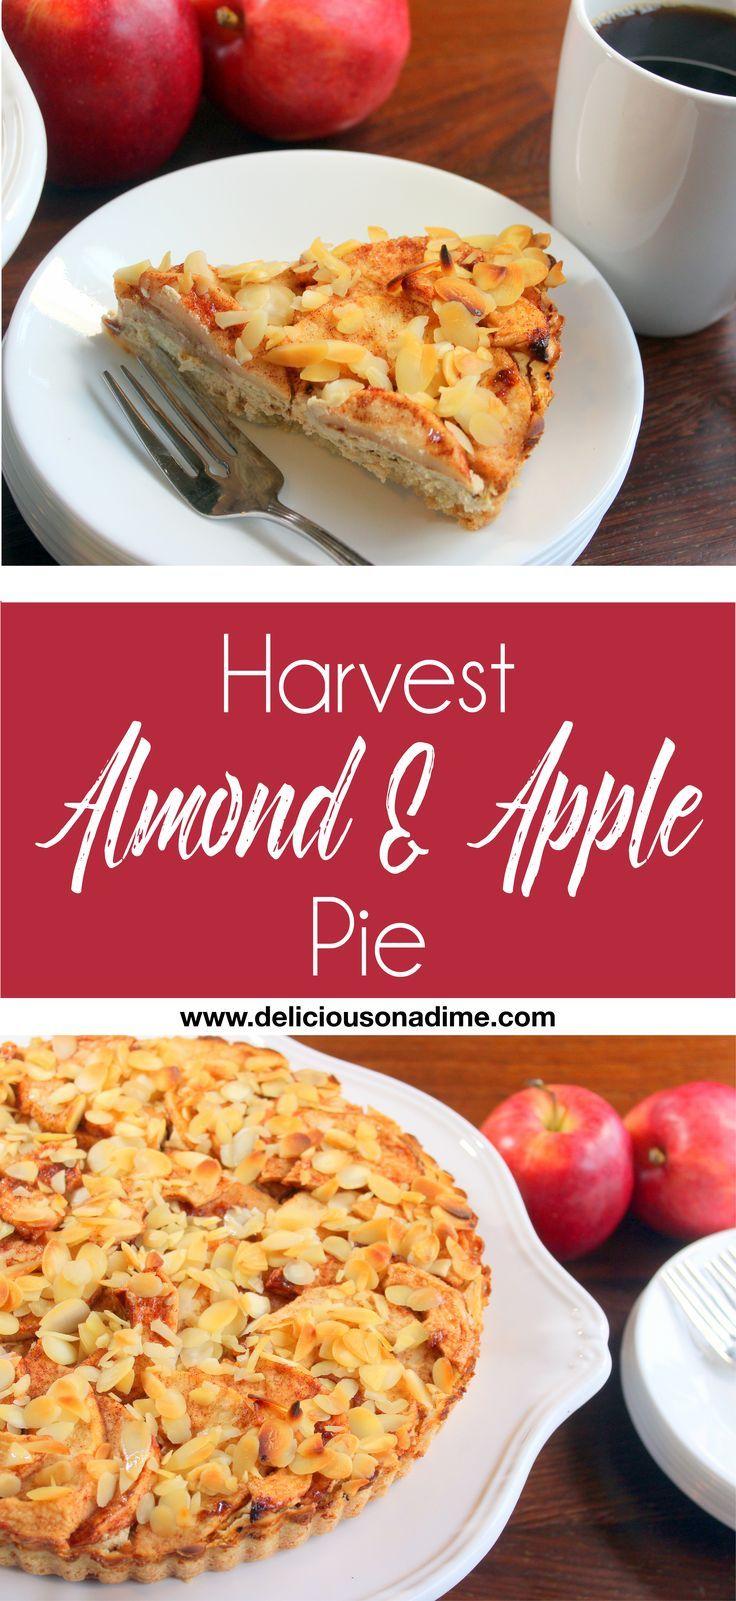 Apple & Almond Pie - Such an amazing fall dessert!